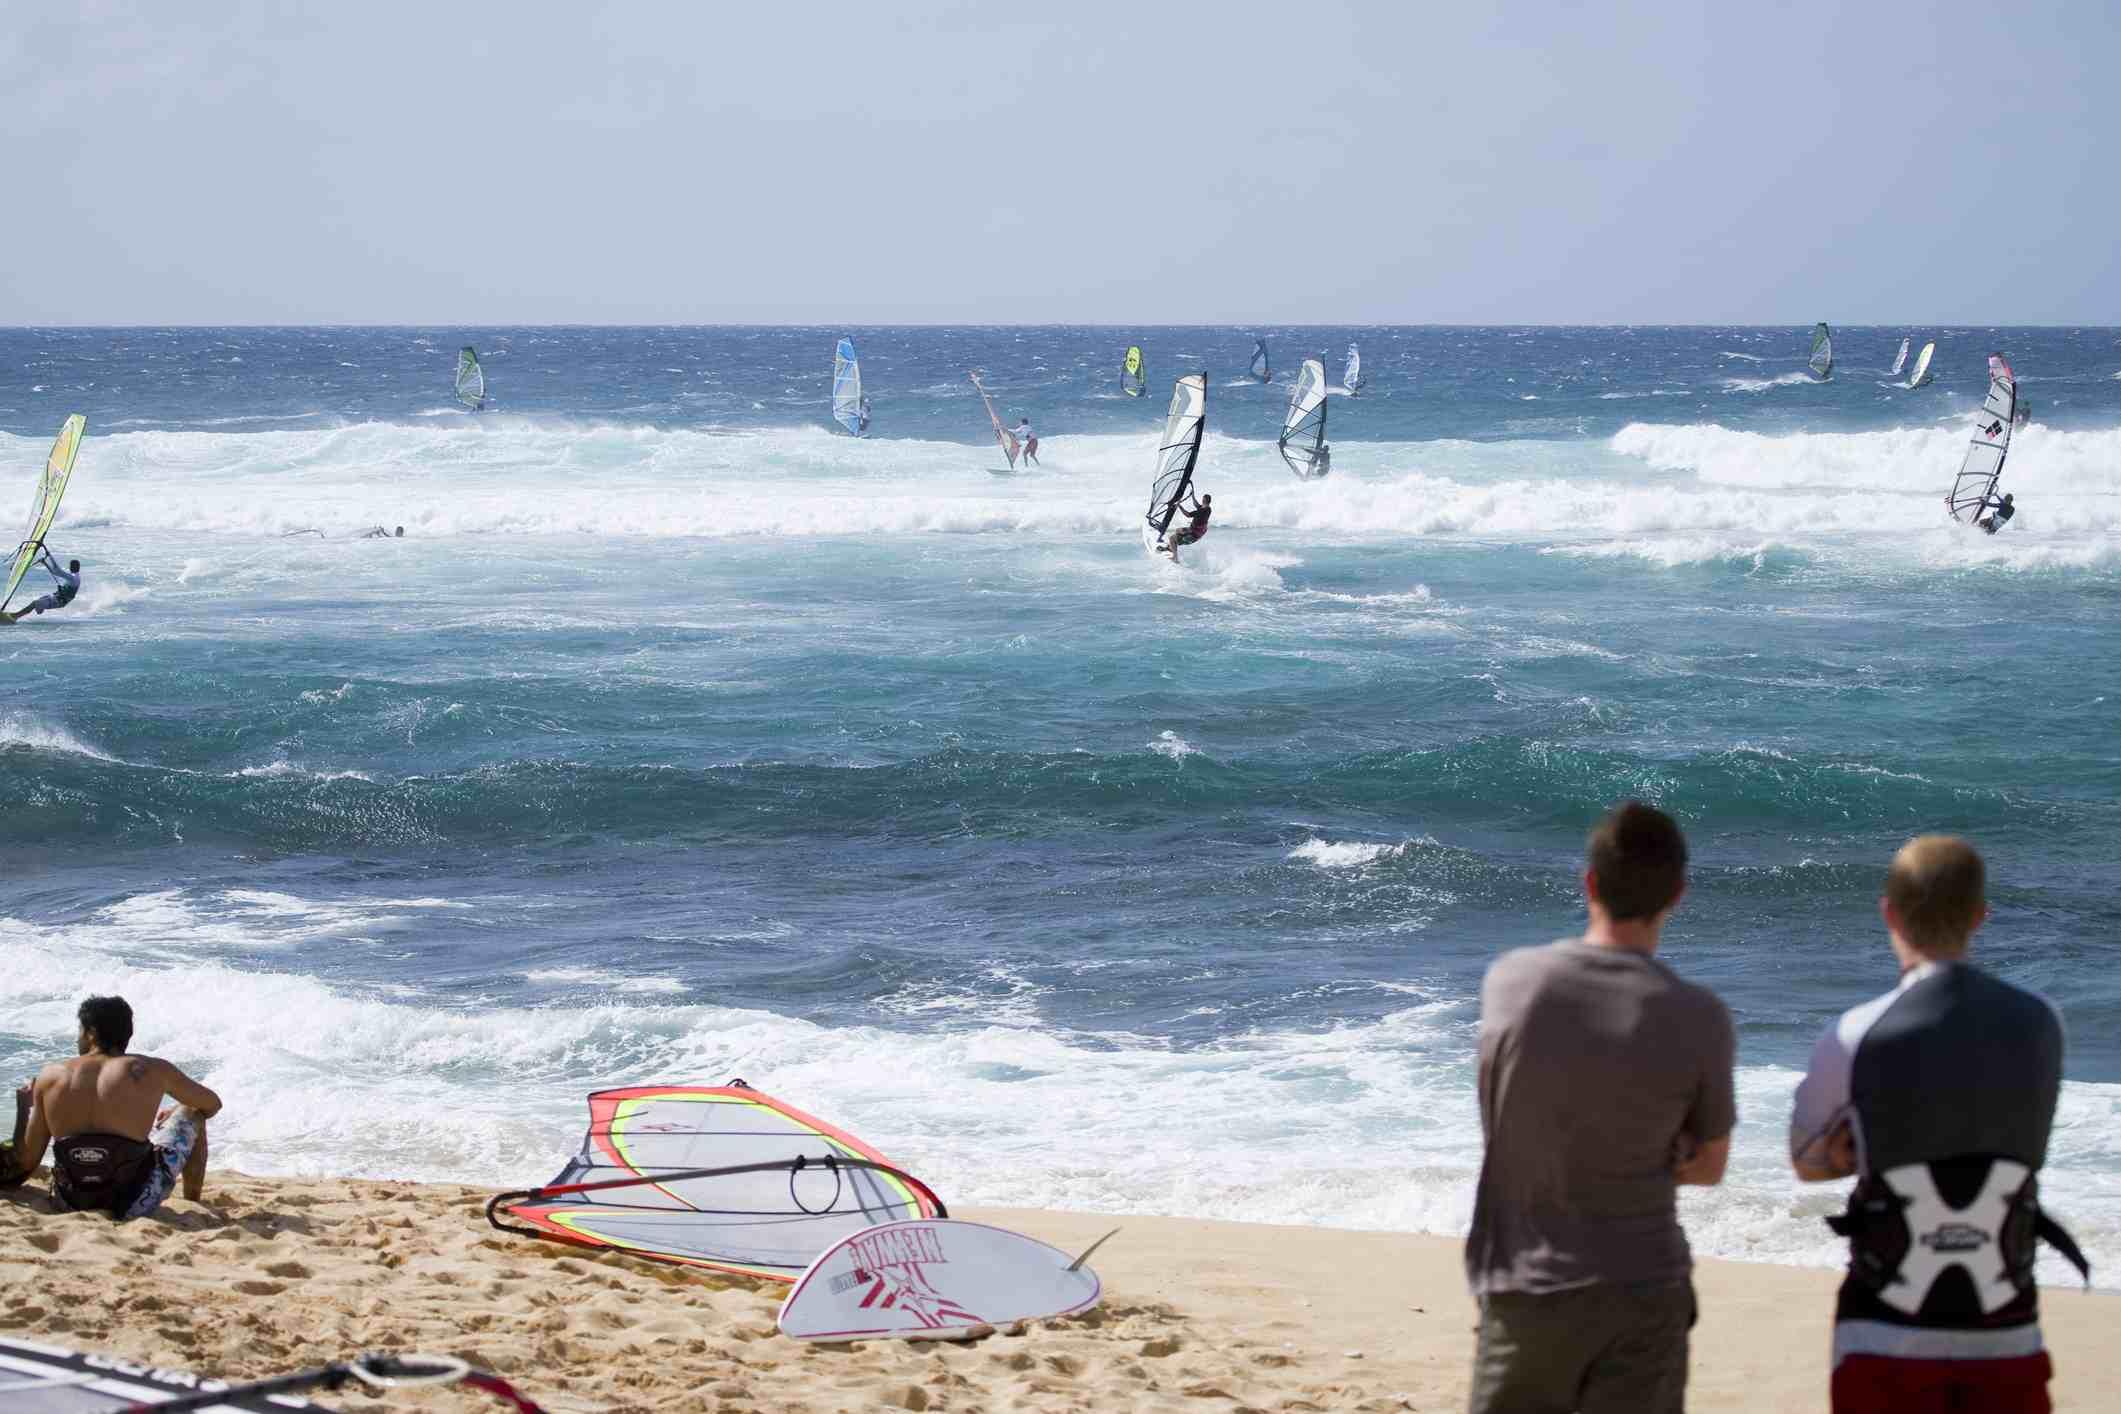 Watching windsurfers at Ho'okipa Beach, Pai'ia, North Shore.